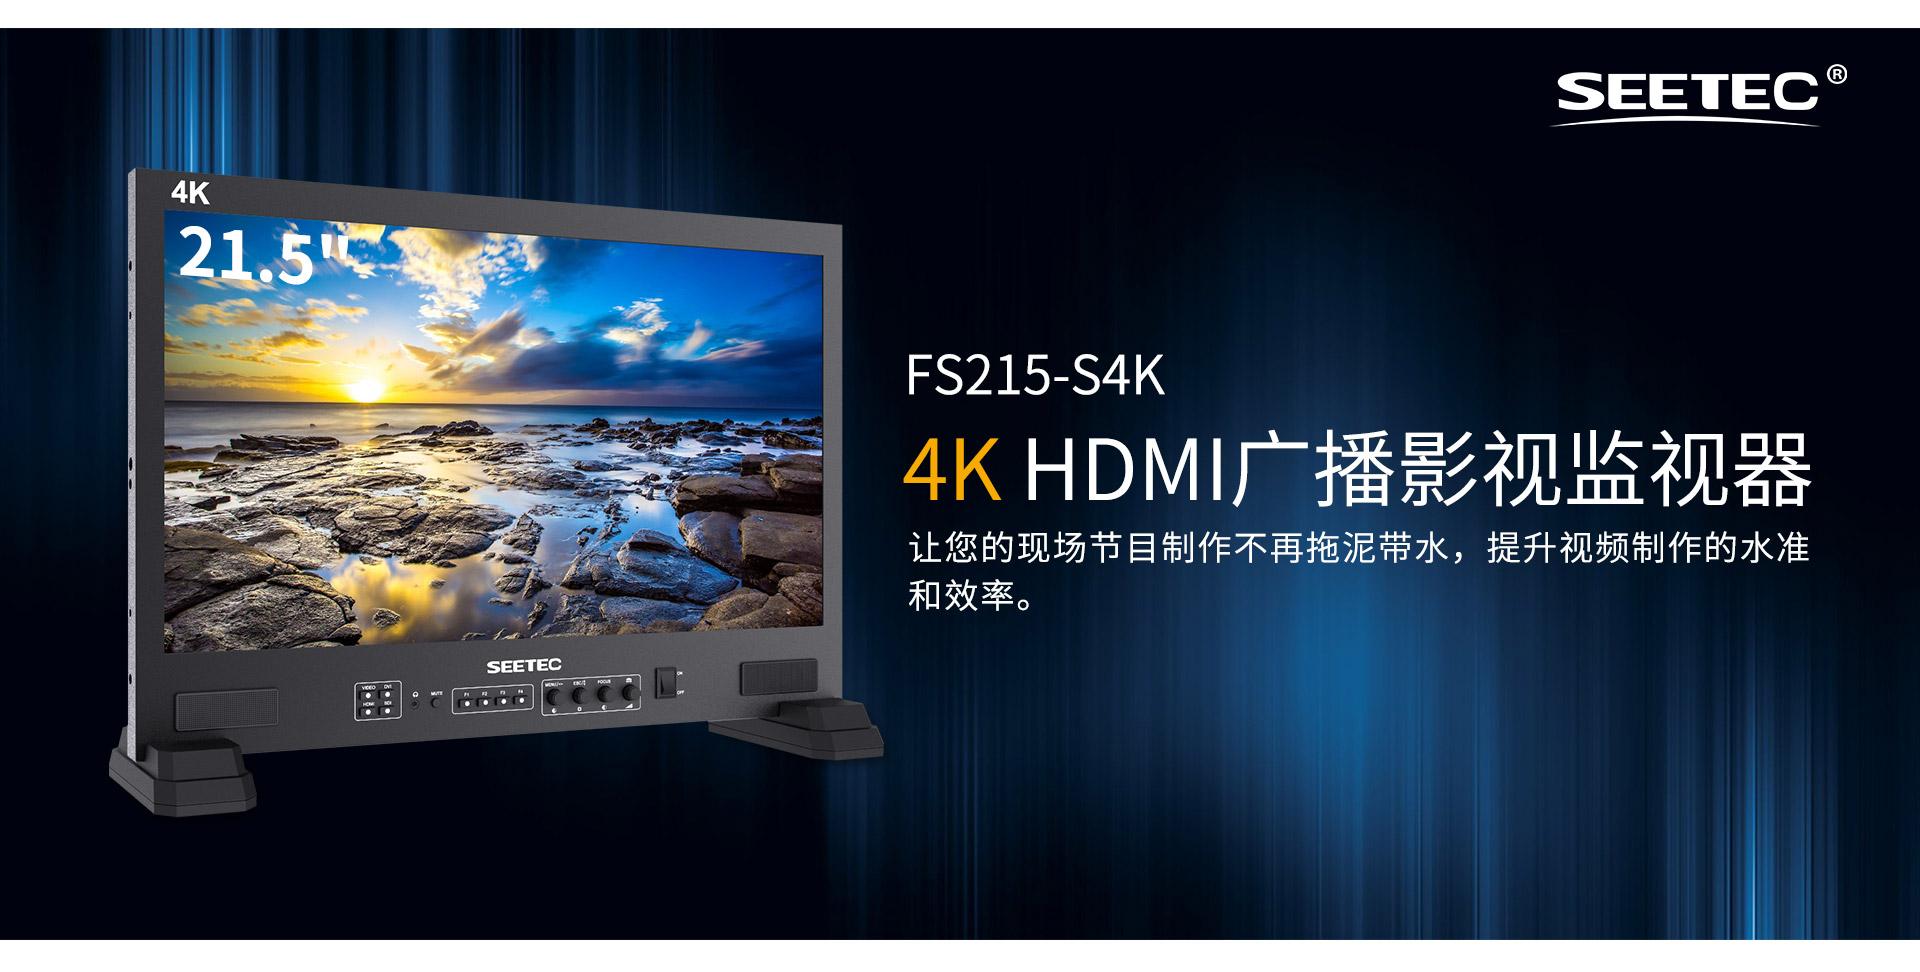 4K-HDMI广播影视监视器